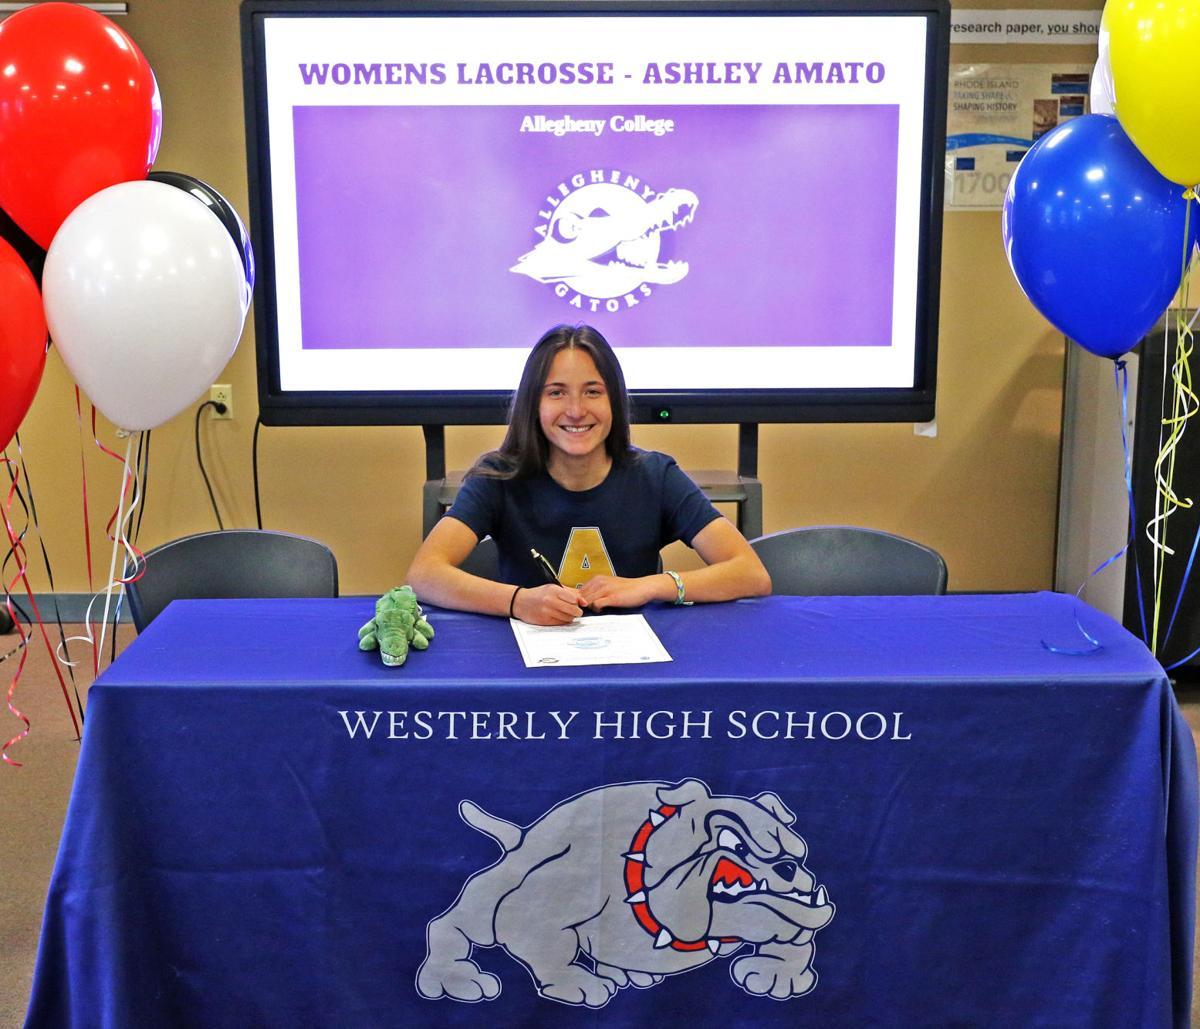 111319 SPT WHS Ashley Amato college signing 938.JPG